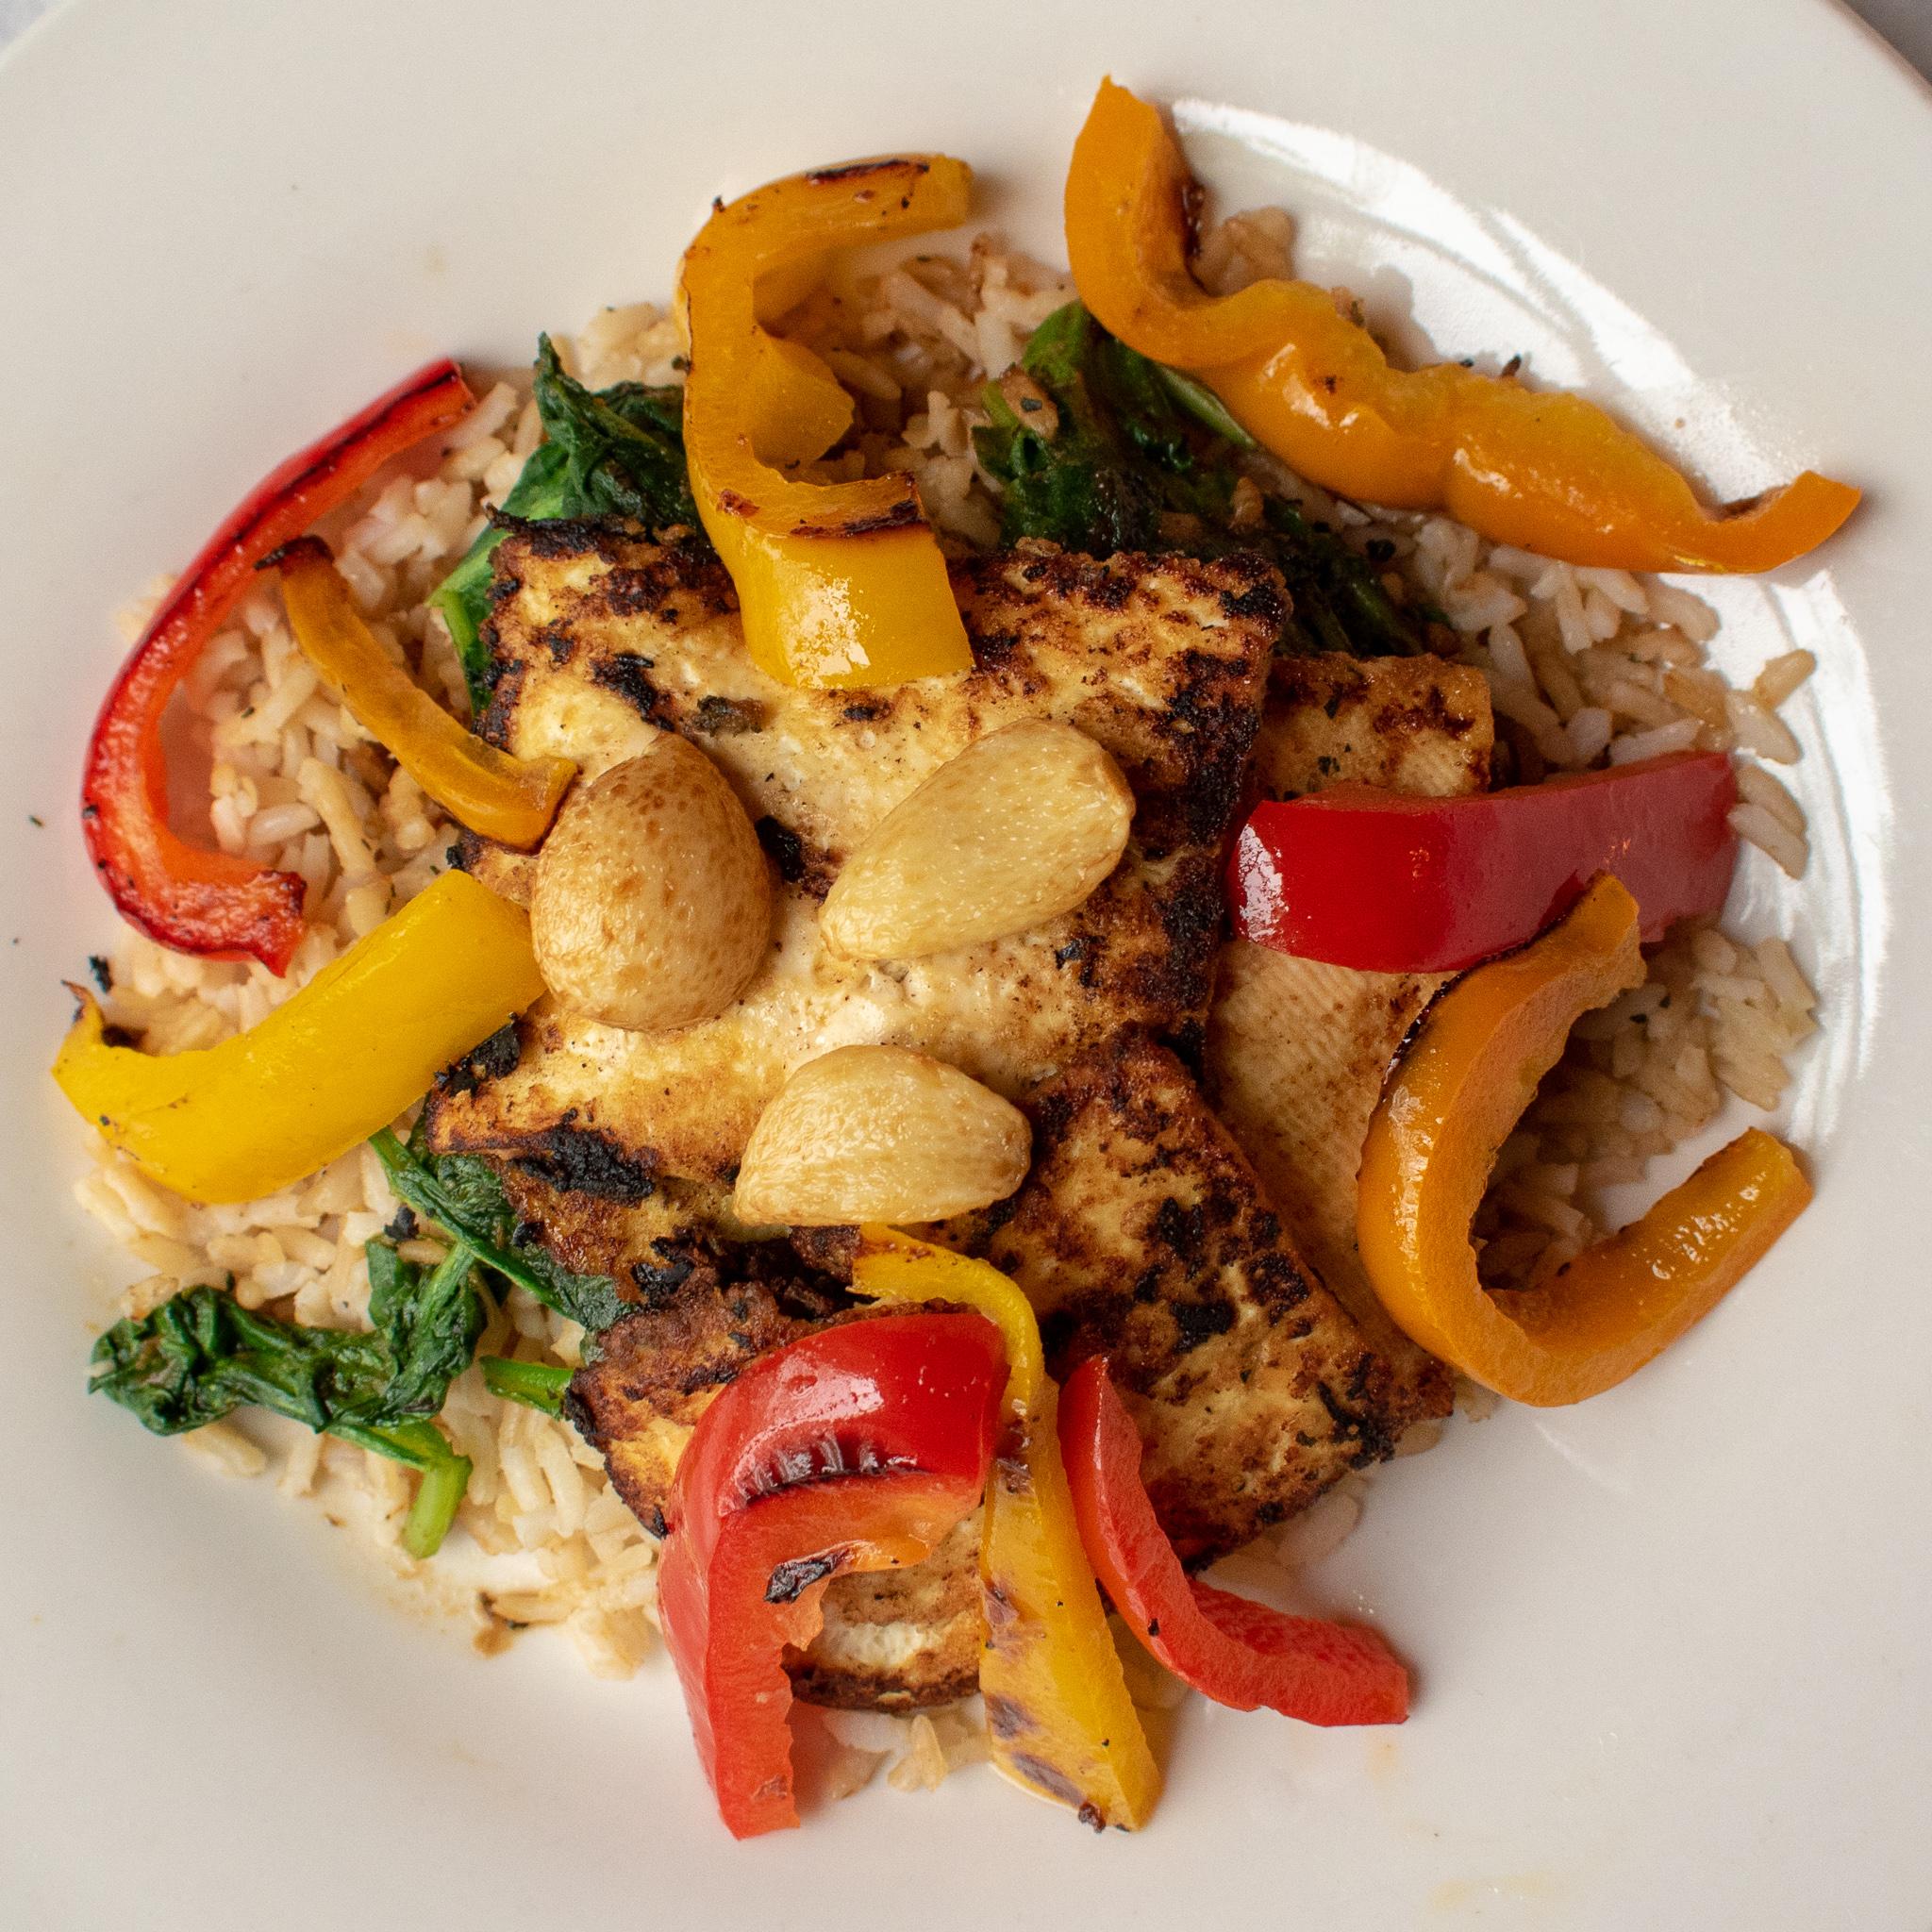 Uprooted-Traveler-Vegan-Food-Guide-Chicago-Origional-Soul-Vegetarian-tofu-blackened-creole.jpg